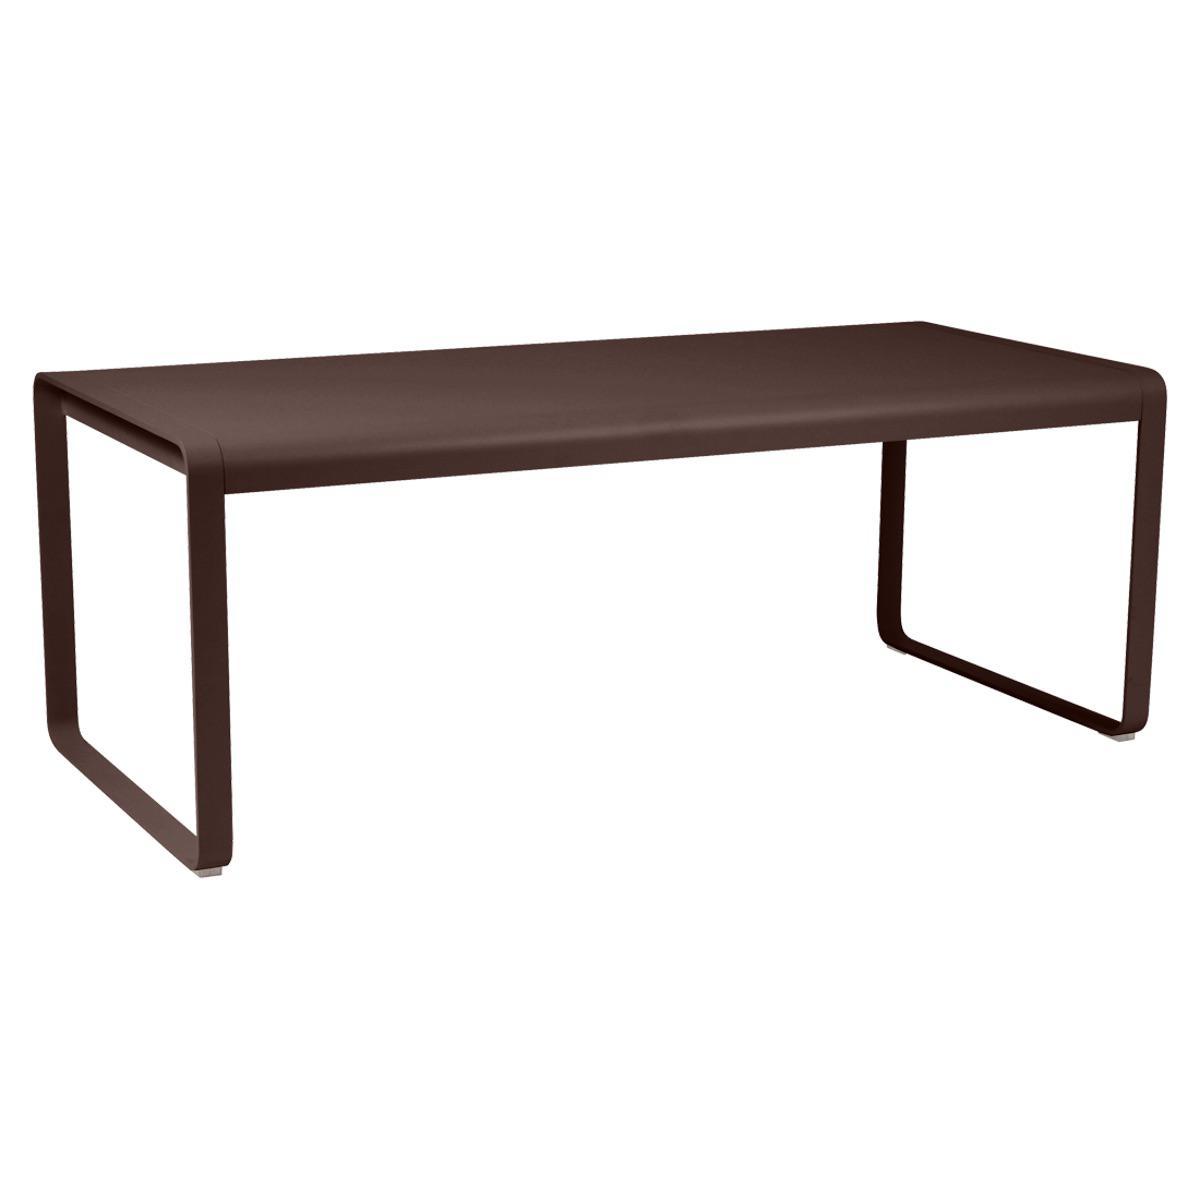 Table 90x196cm BELLEVIE PREMIUM Fermob brun rouille